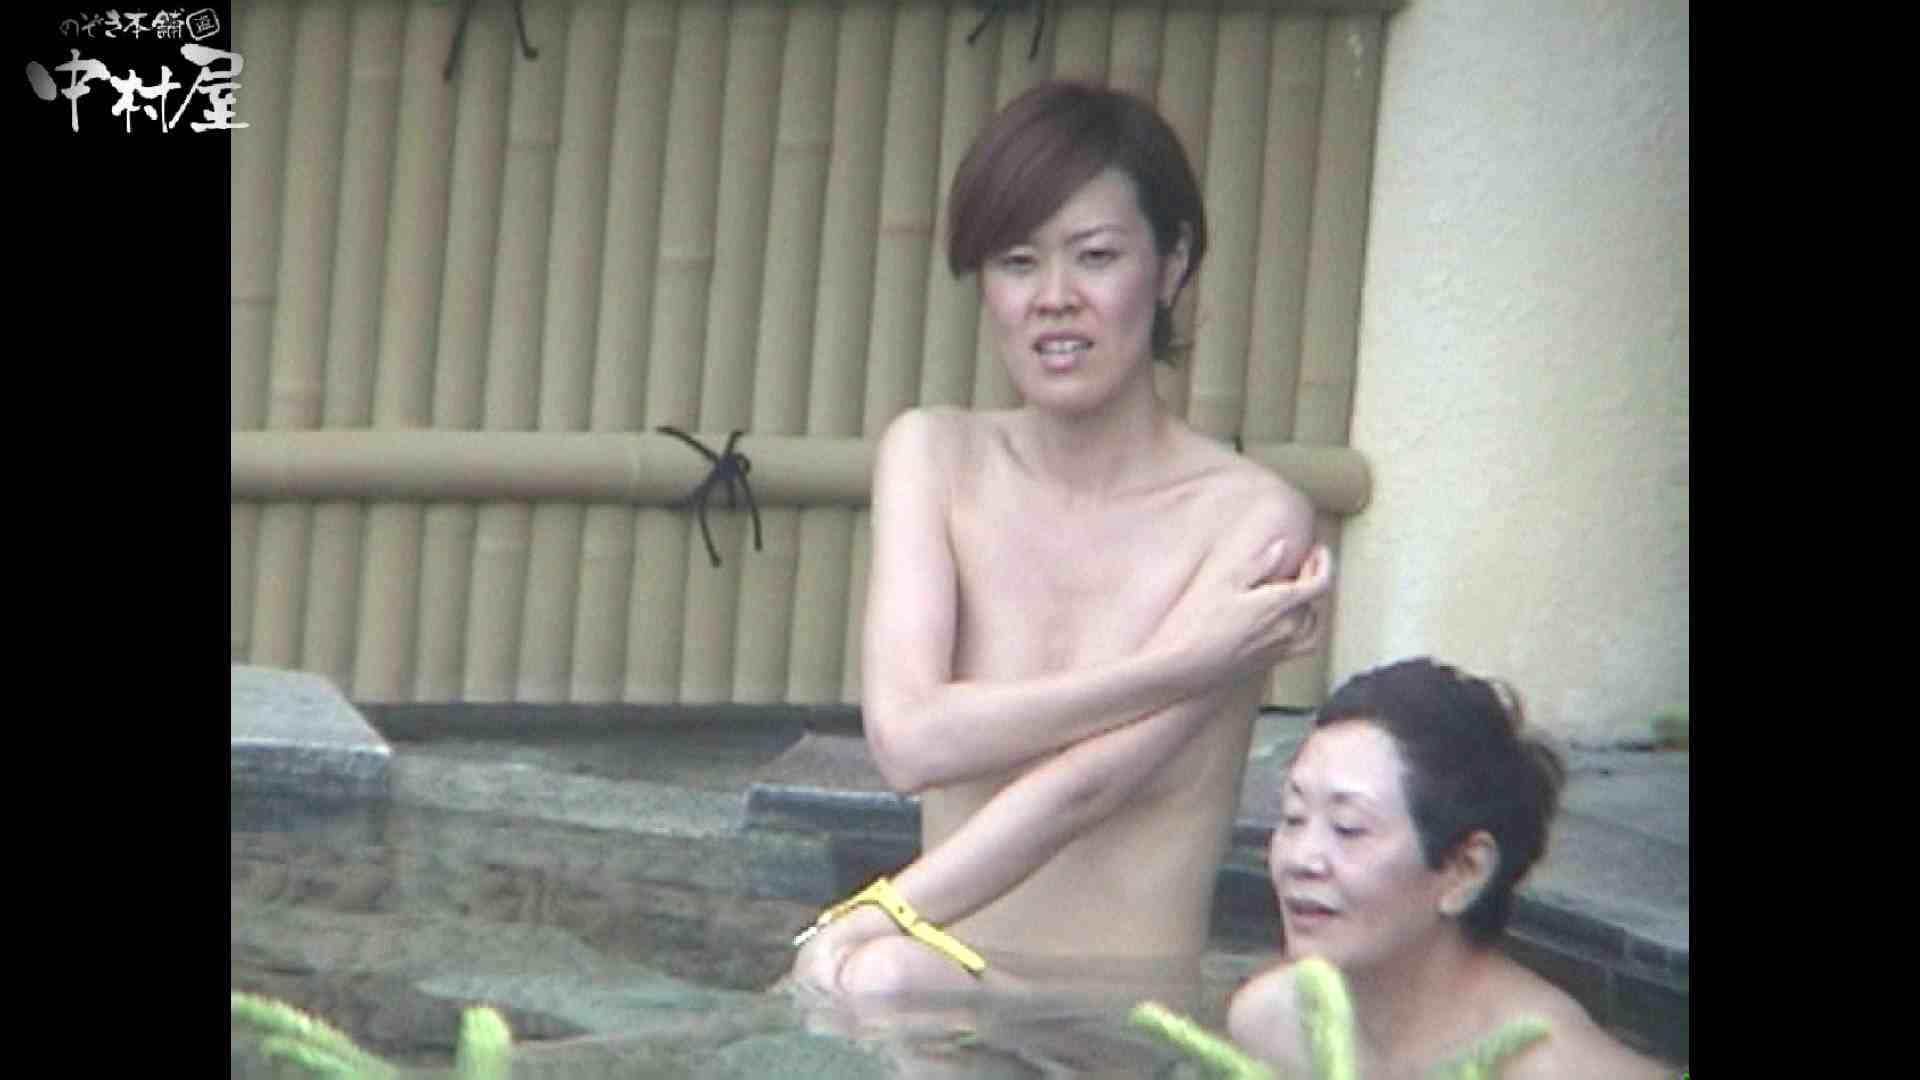 Aquaな露天風呂Vol.961 OLセックス | 盗撮  86画像 70